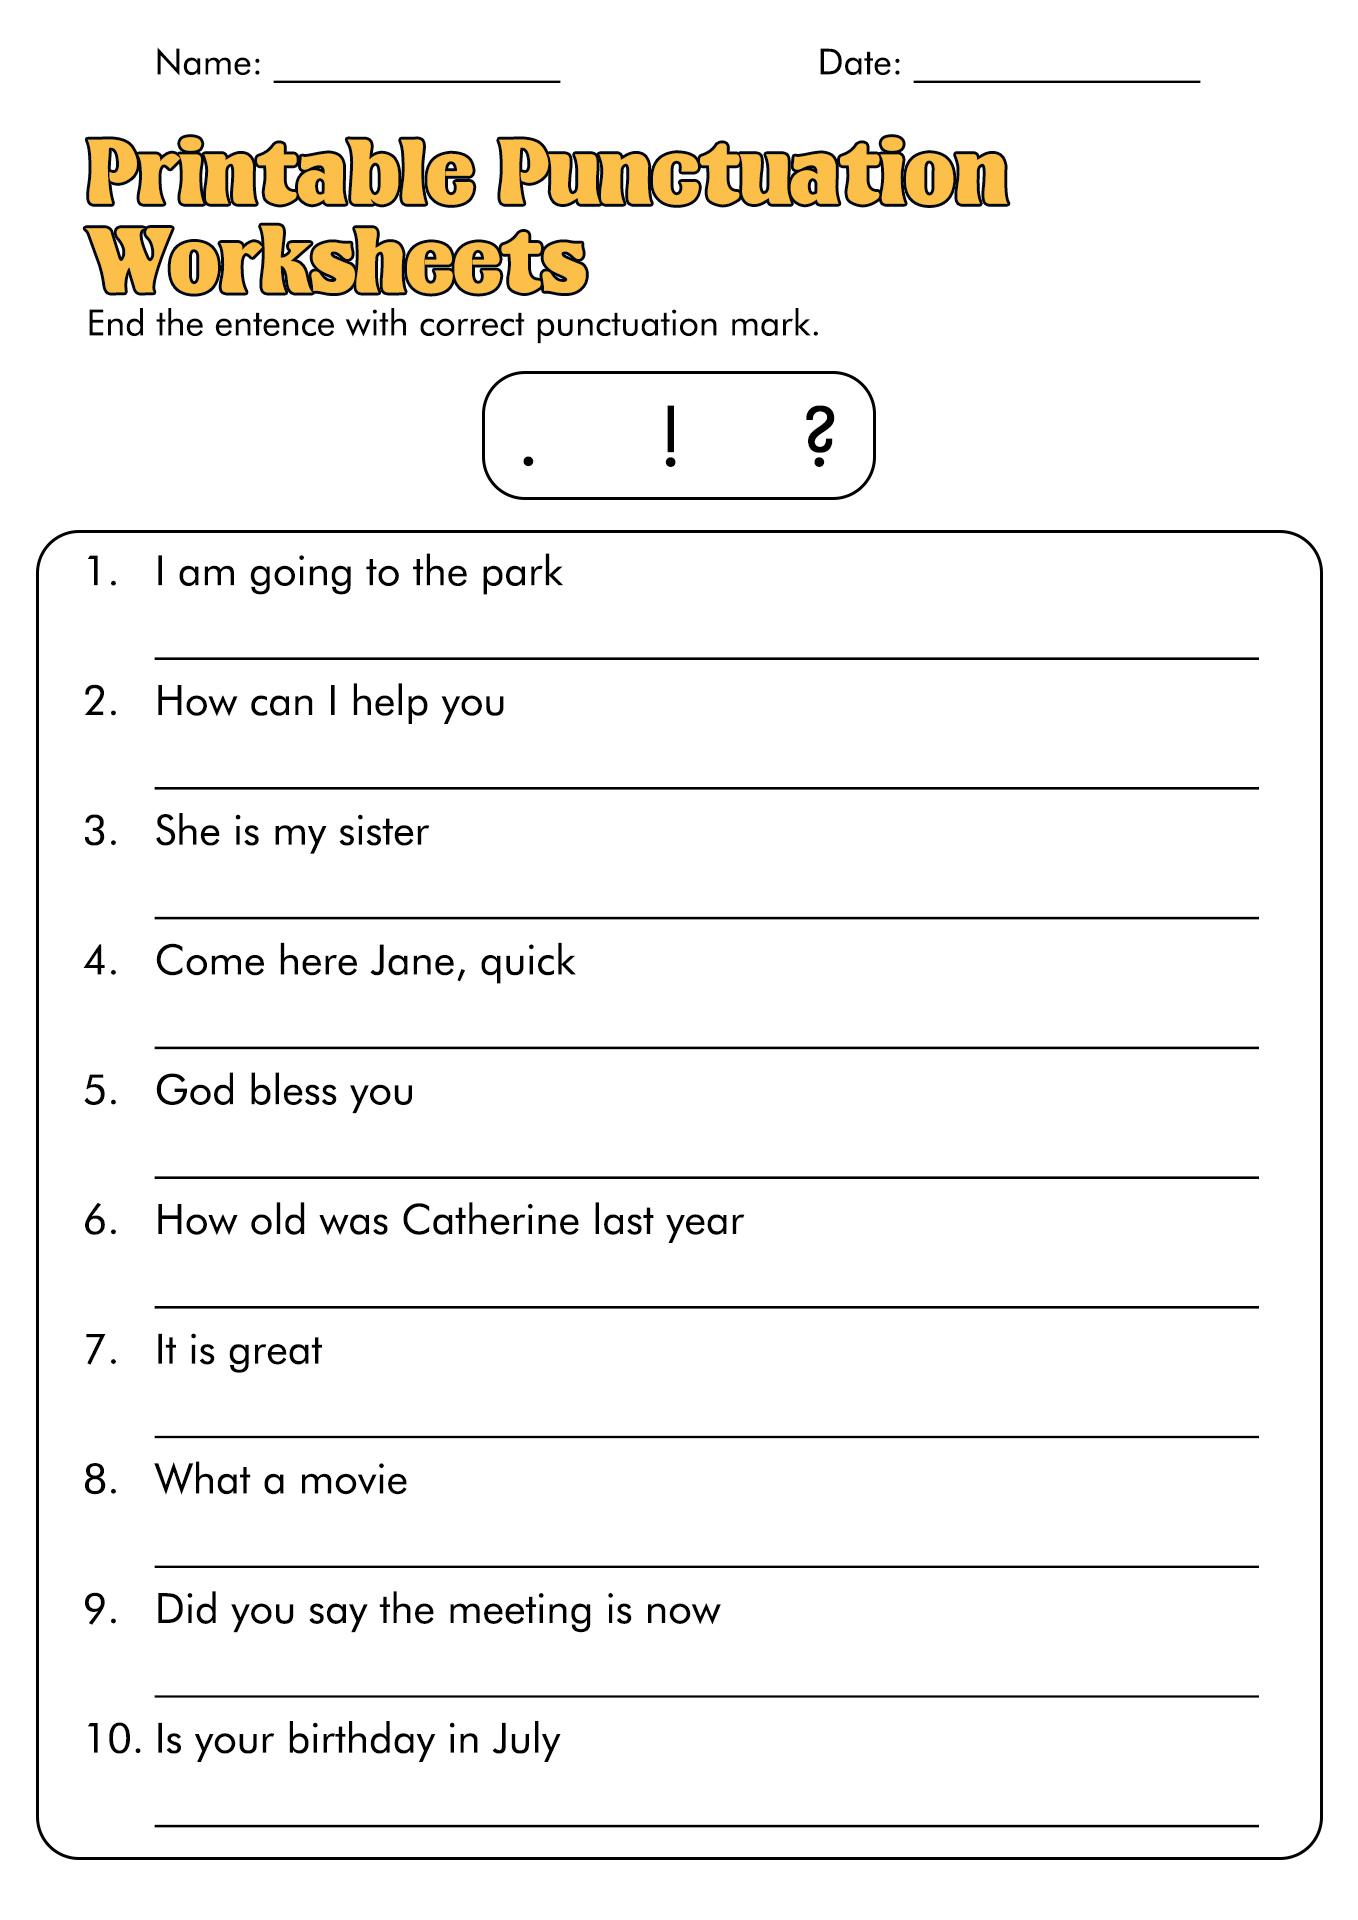 Best Custom Academic Essay Writing Help Amp Writing Services